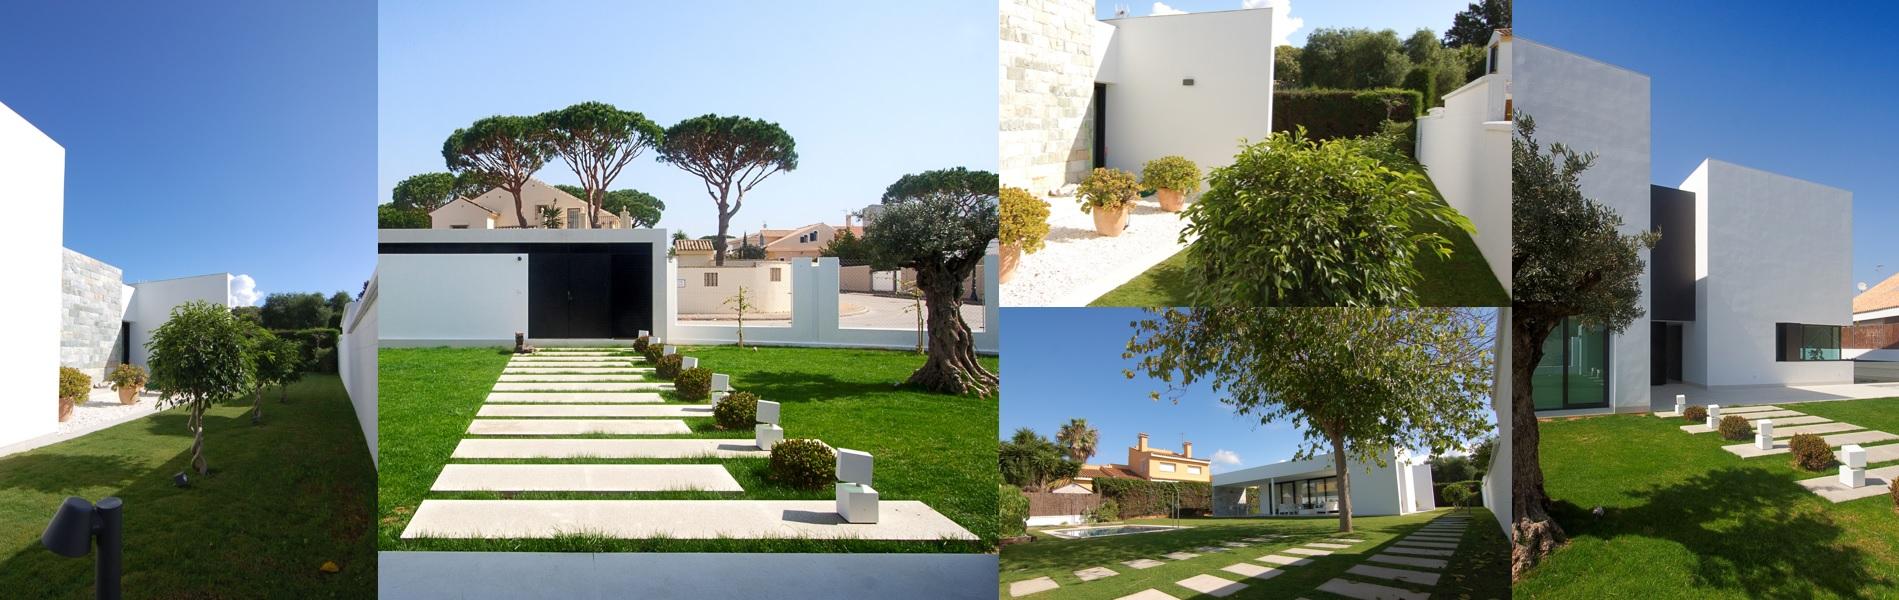 paisajismo cadiz, proyecto paisajismo cadiz, landscaping andalusia